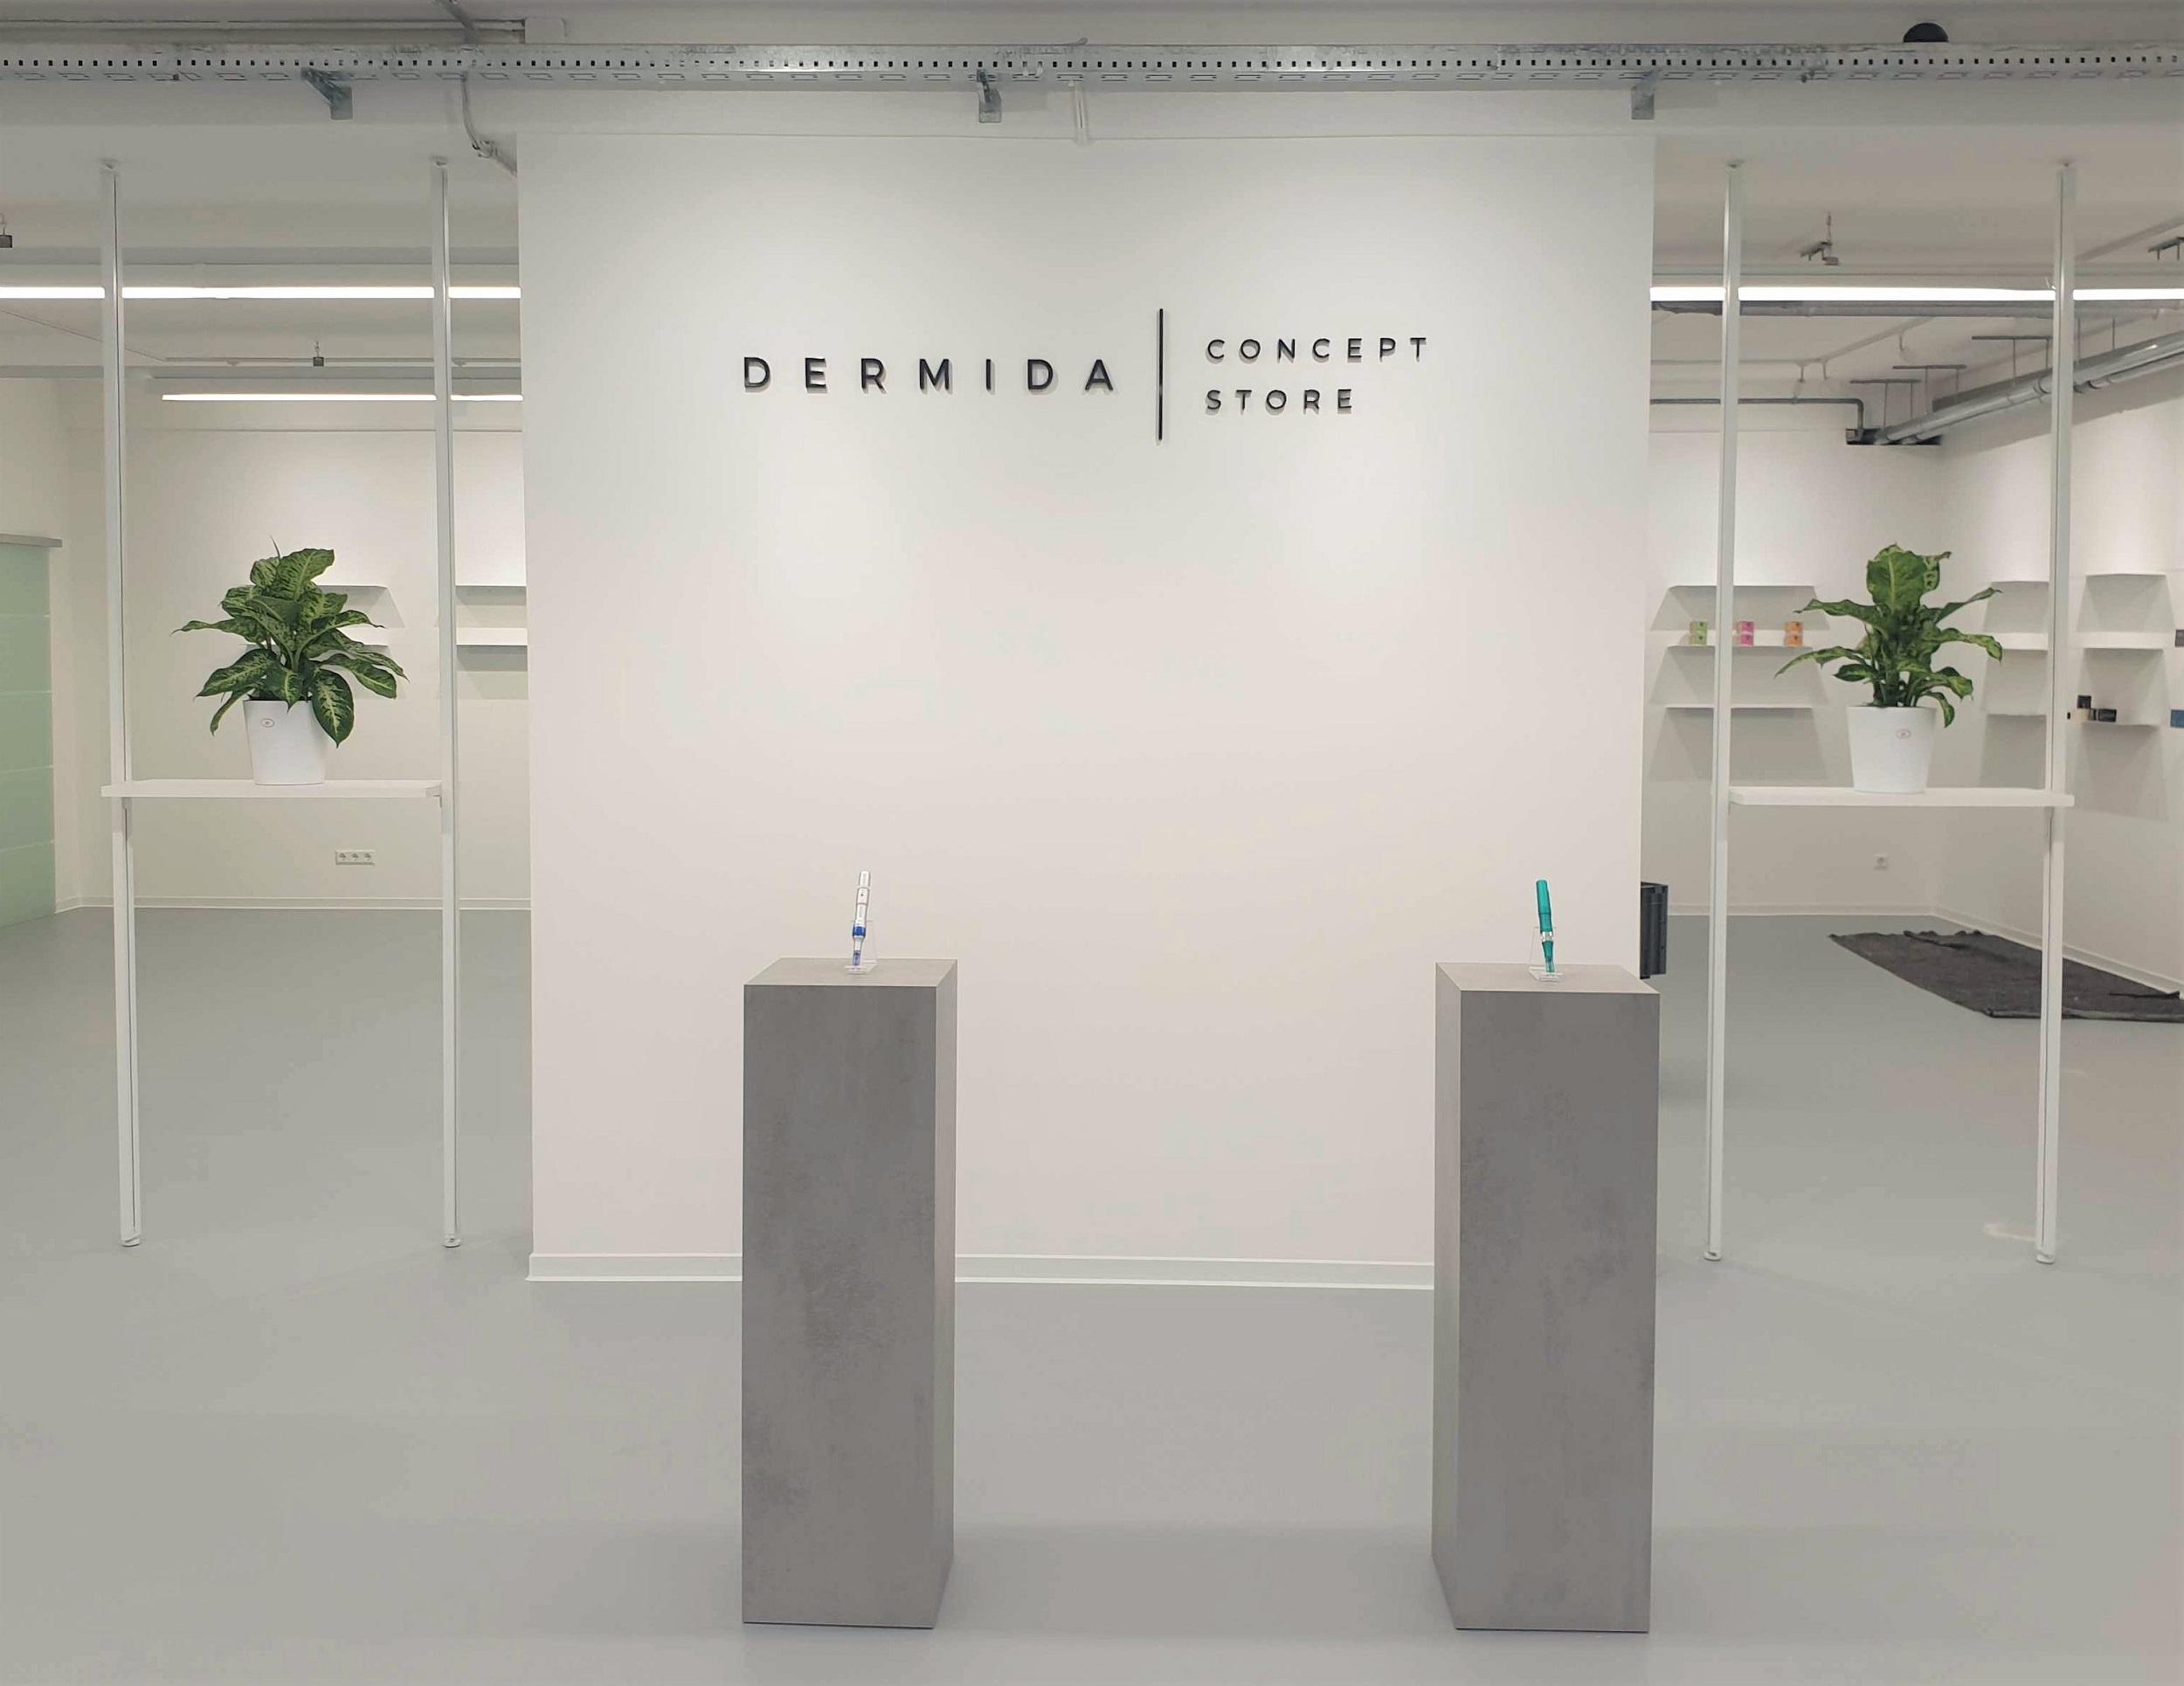 dermida-concept-store-1